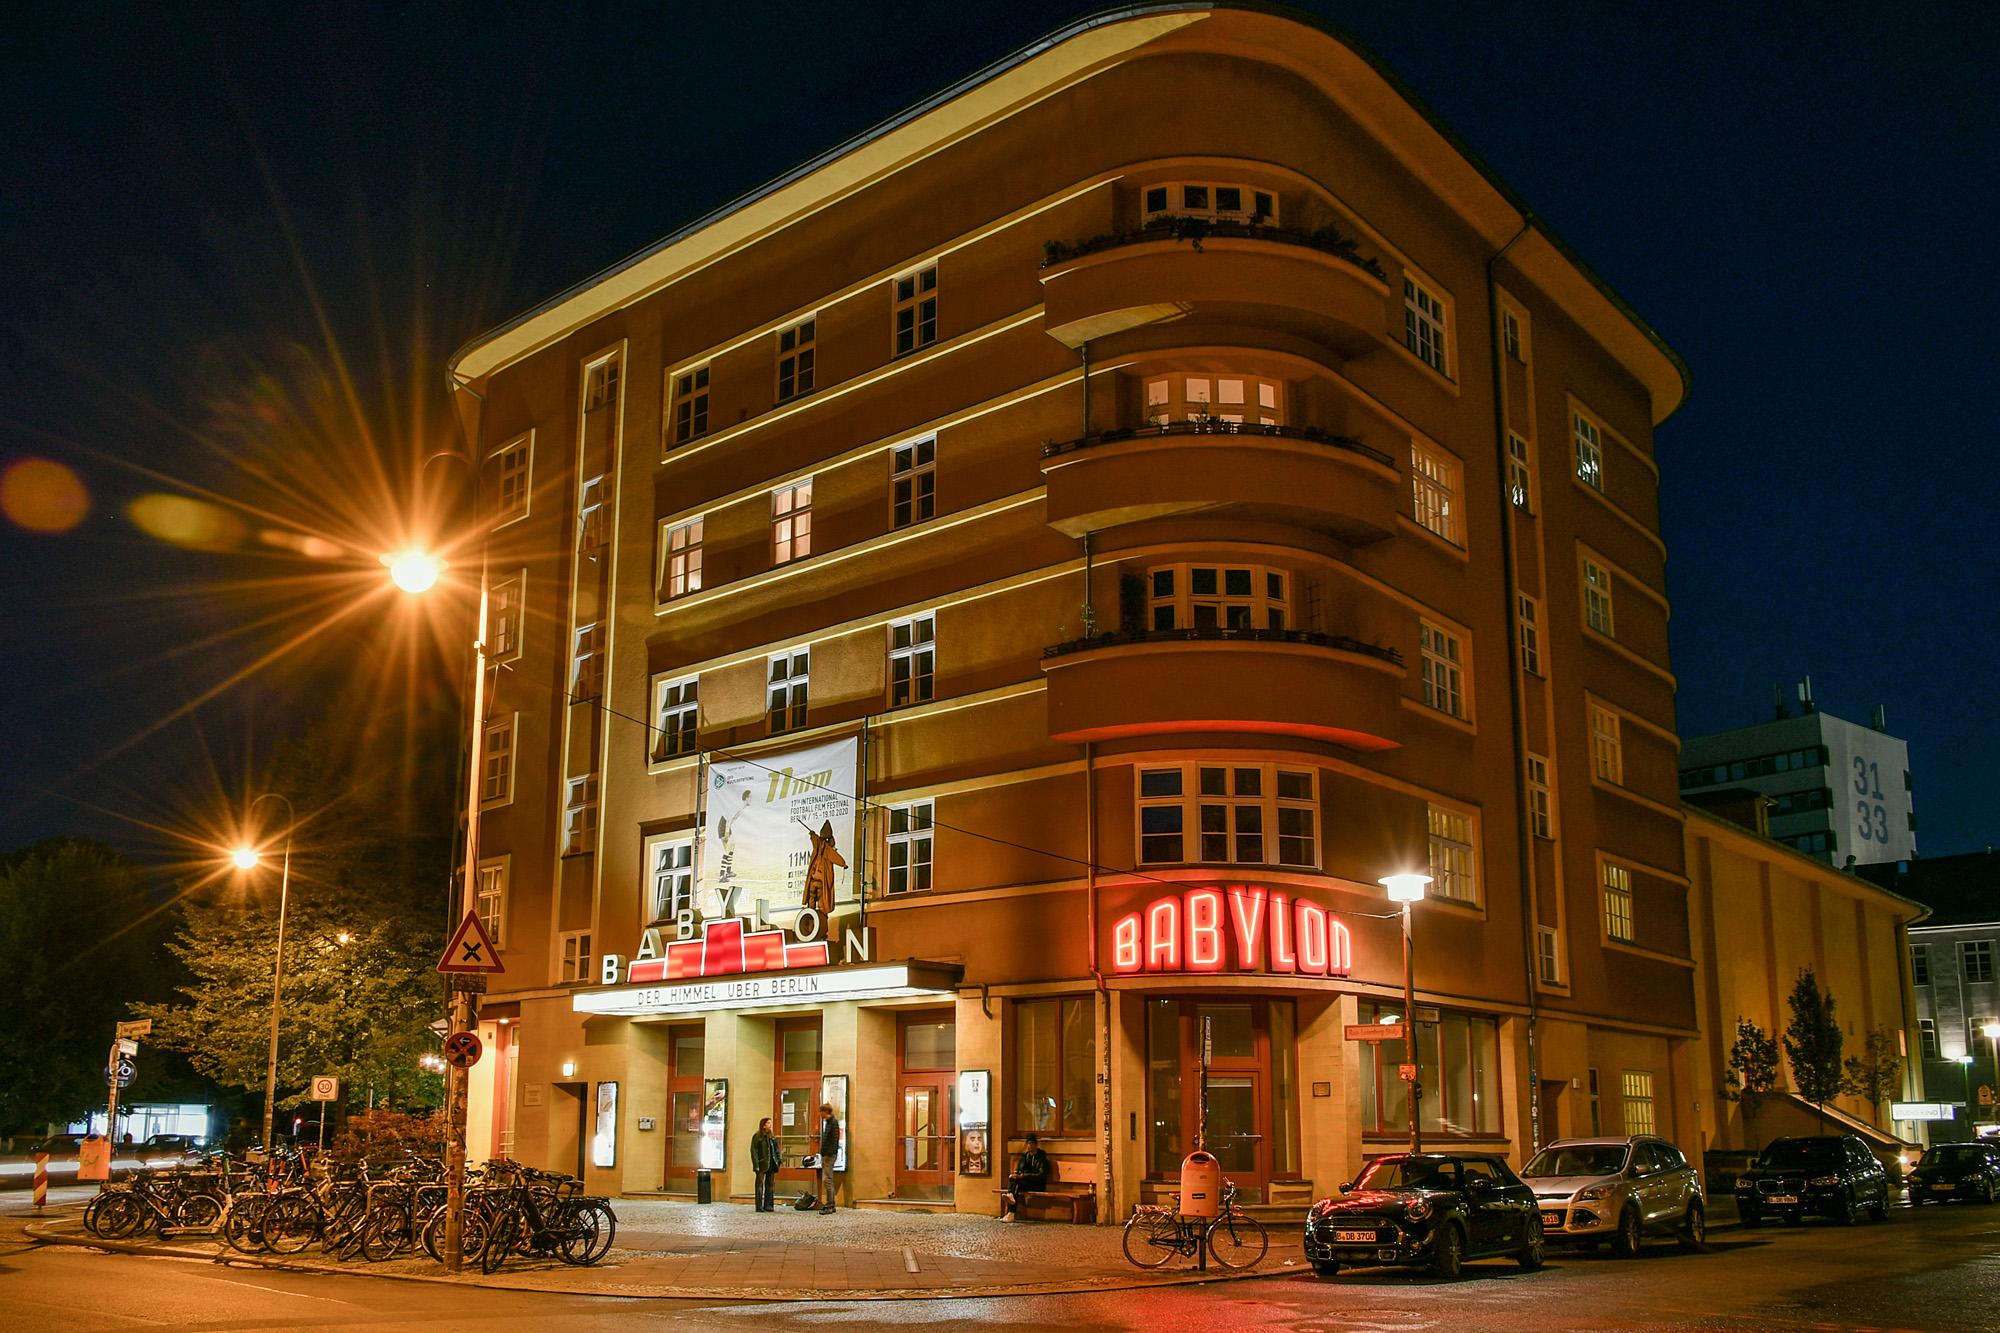 Kino Babylon, Germany